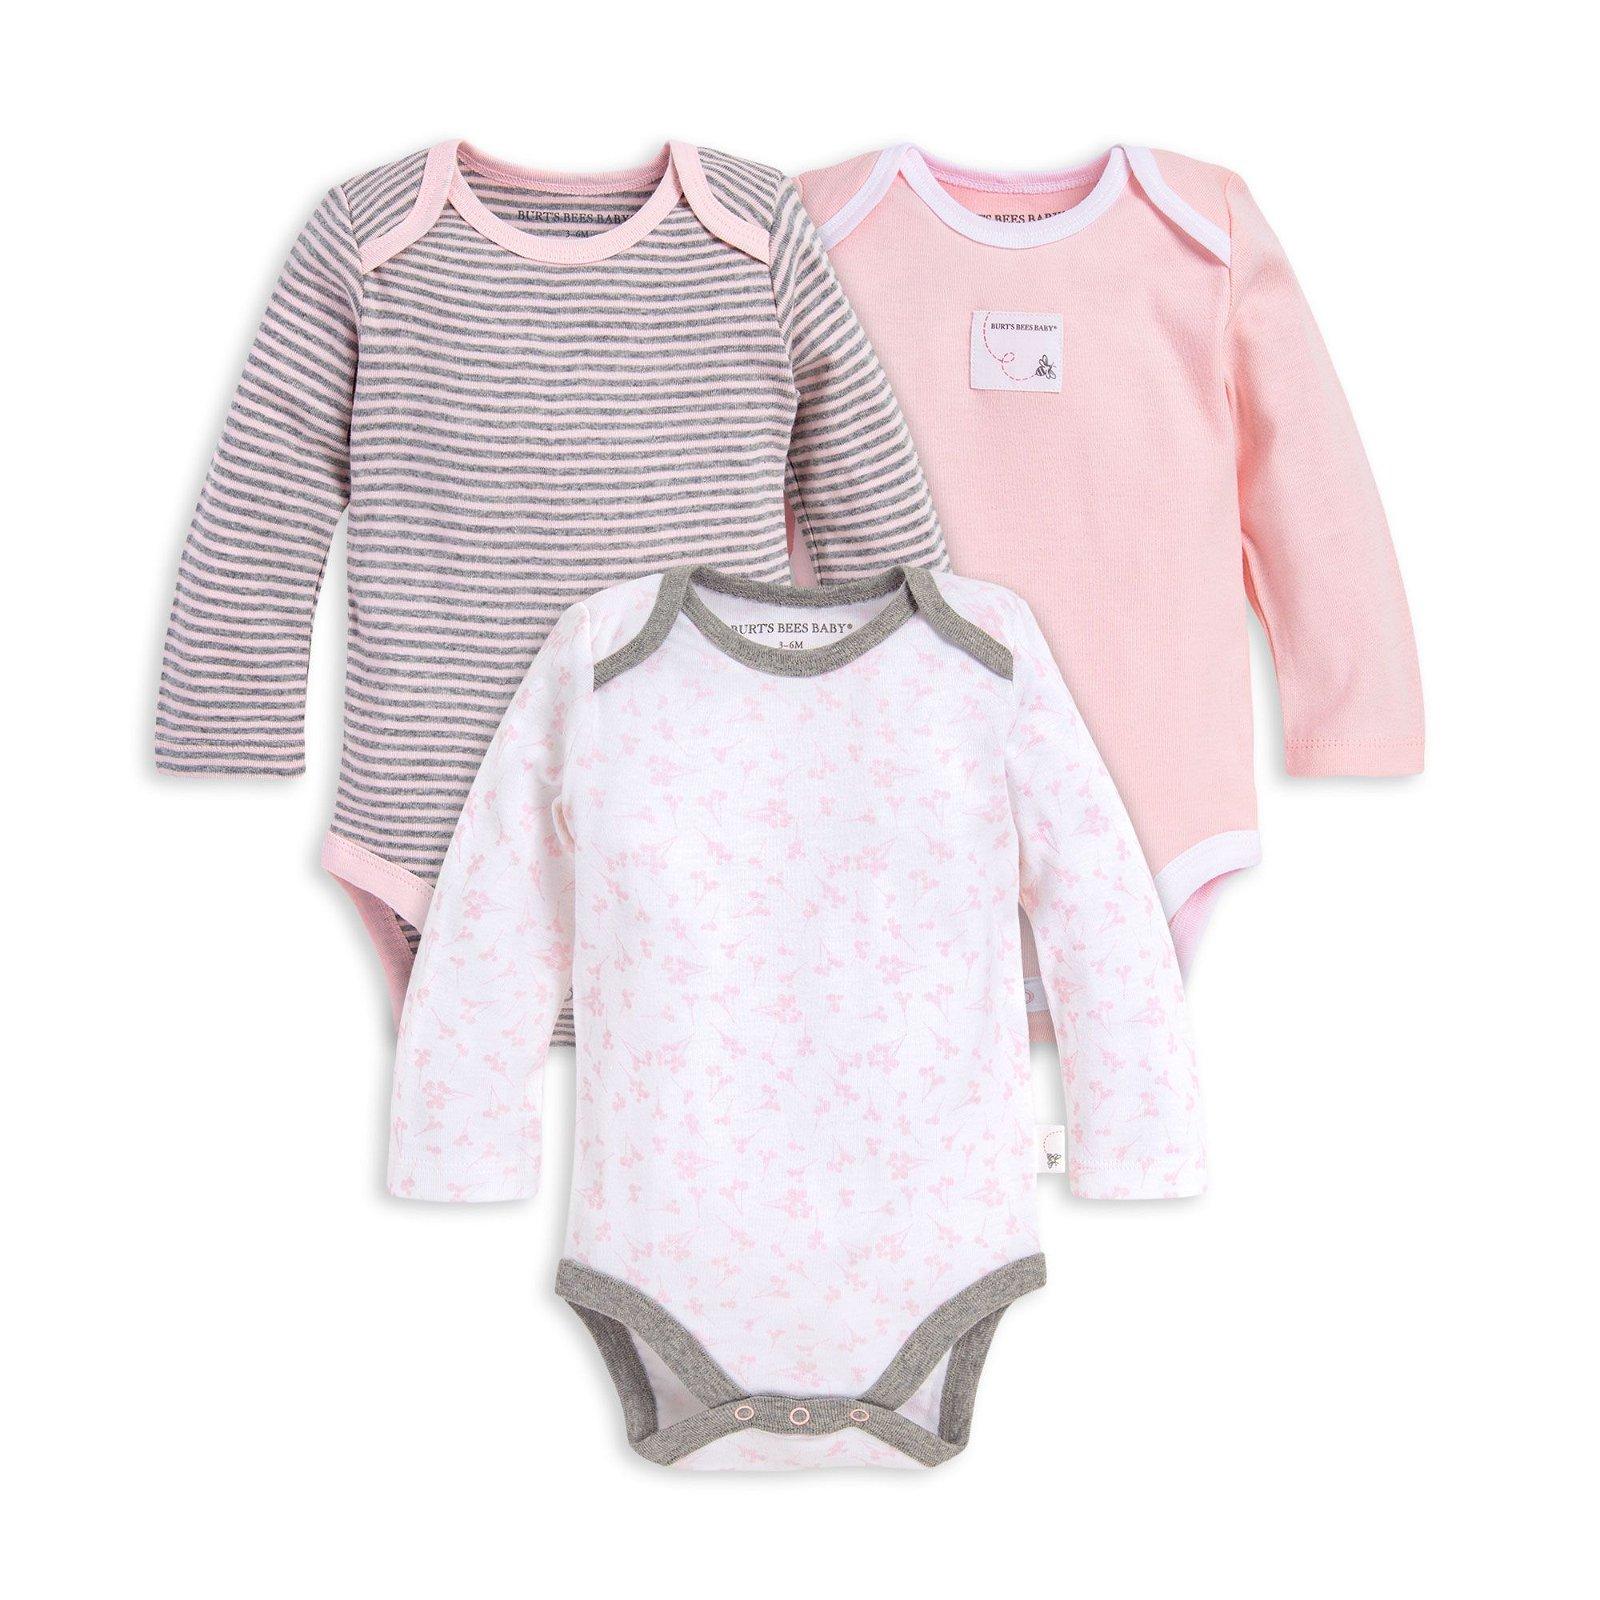 Dusty Dandelions Organic Baby 3 Pack Long Sleeve Bodysuits